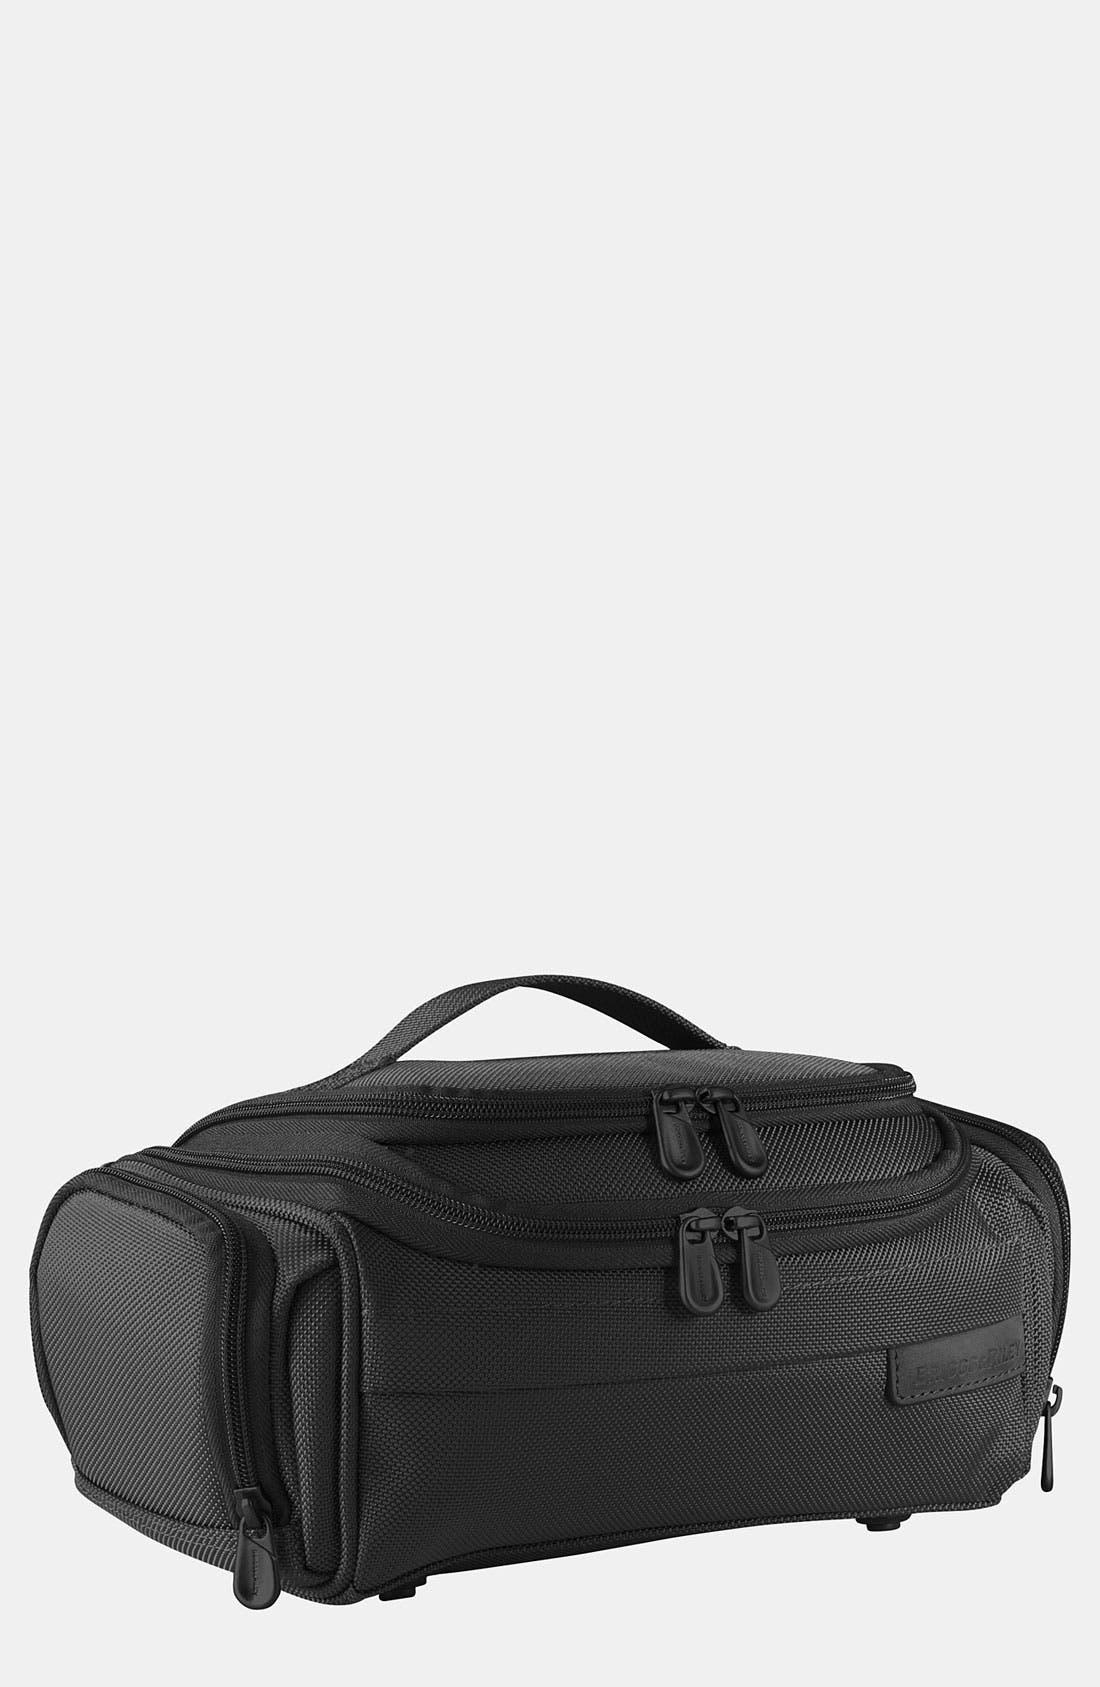 Baseline - Executive Toiletry Kit,                         Main,                         color, BLACK